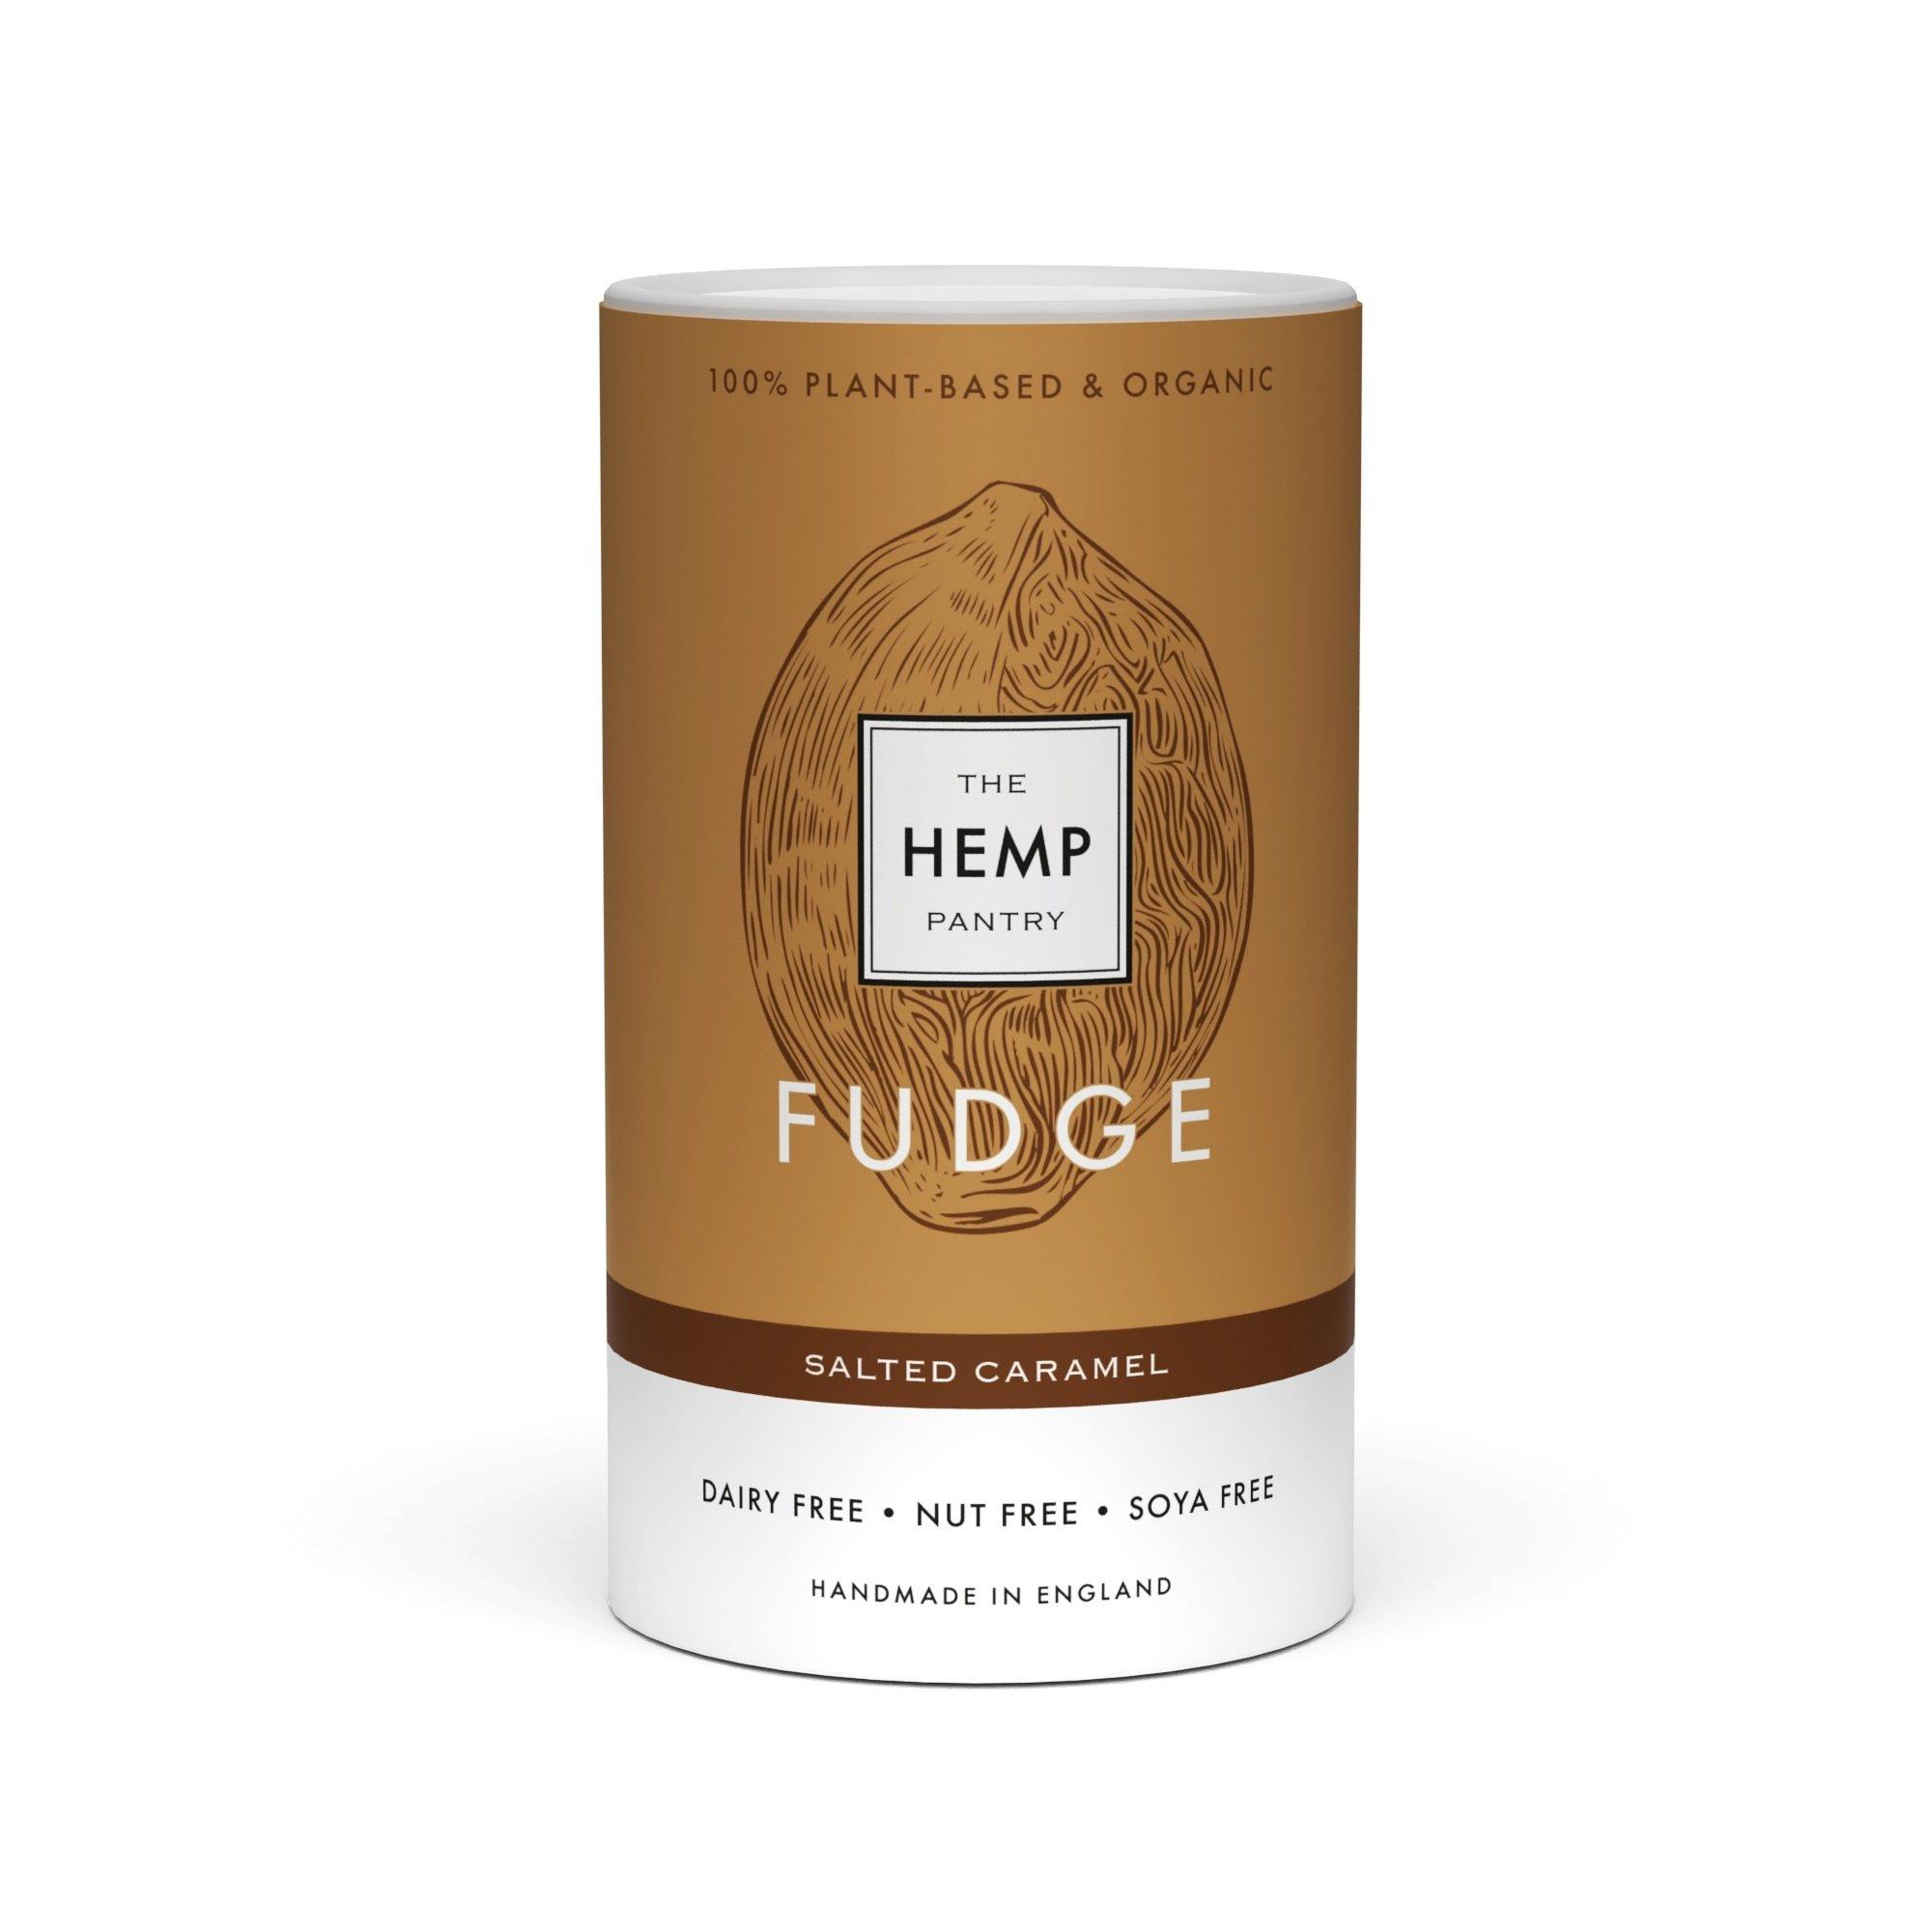 Organic Vegan Salted Caramel Fudge 175g Kind Shop